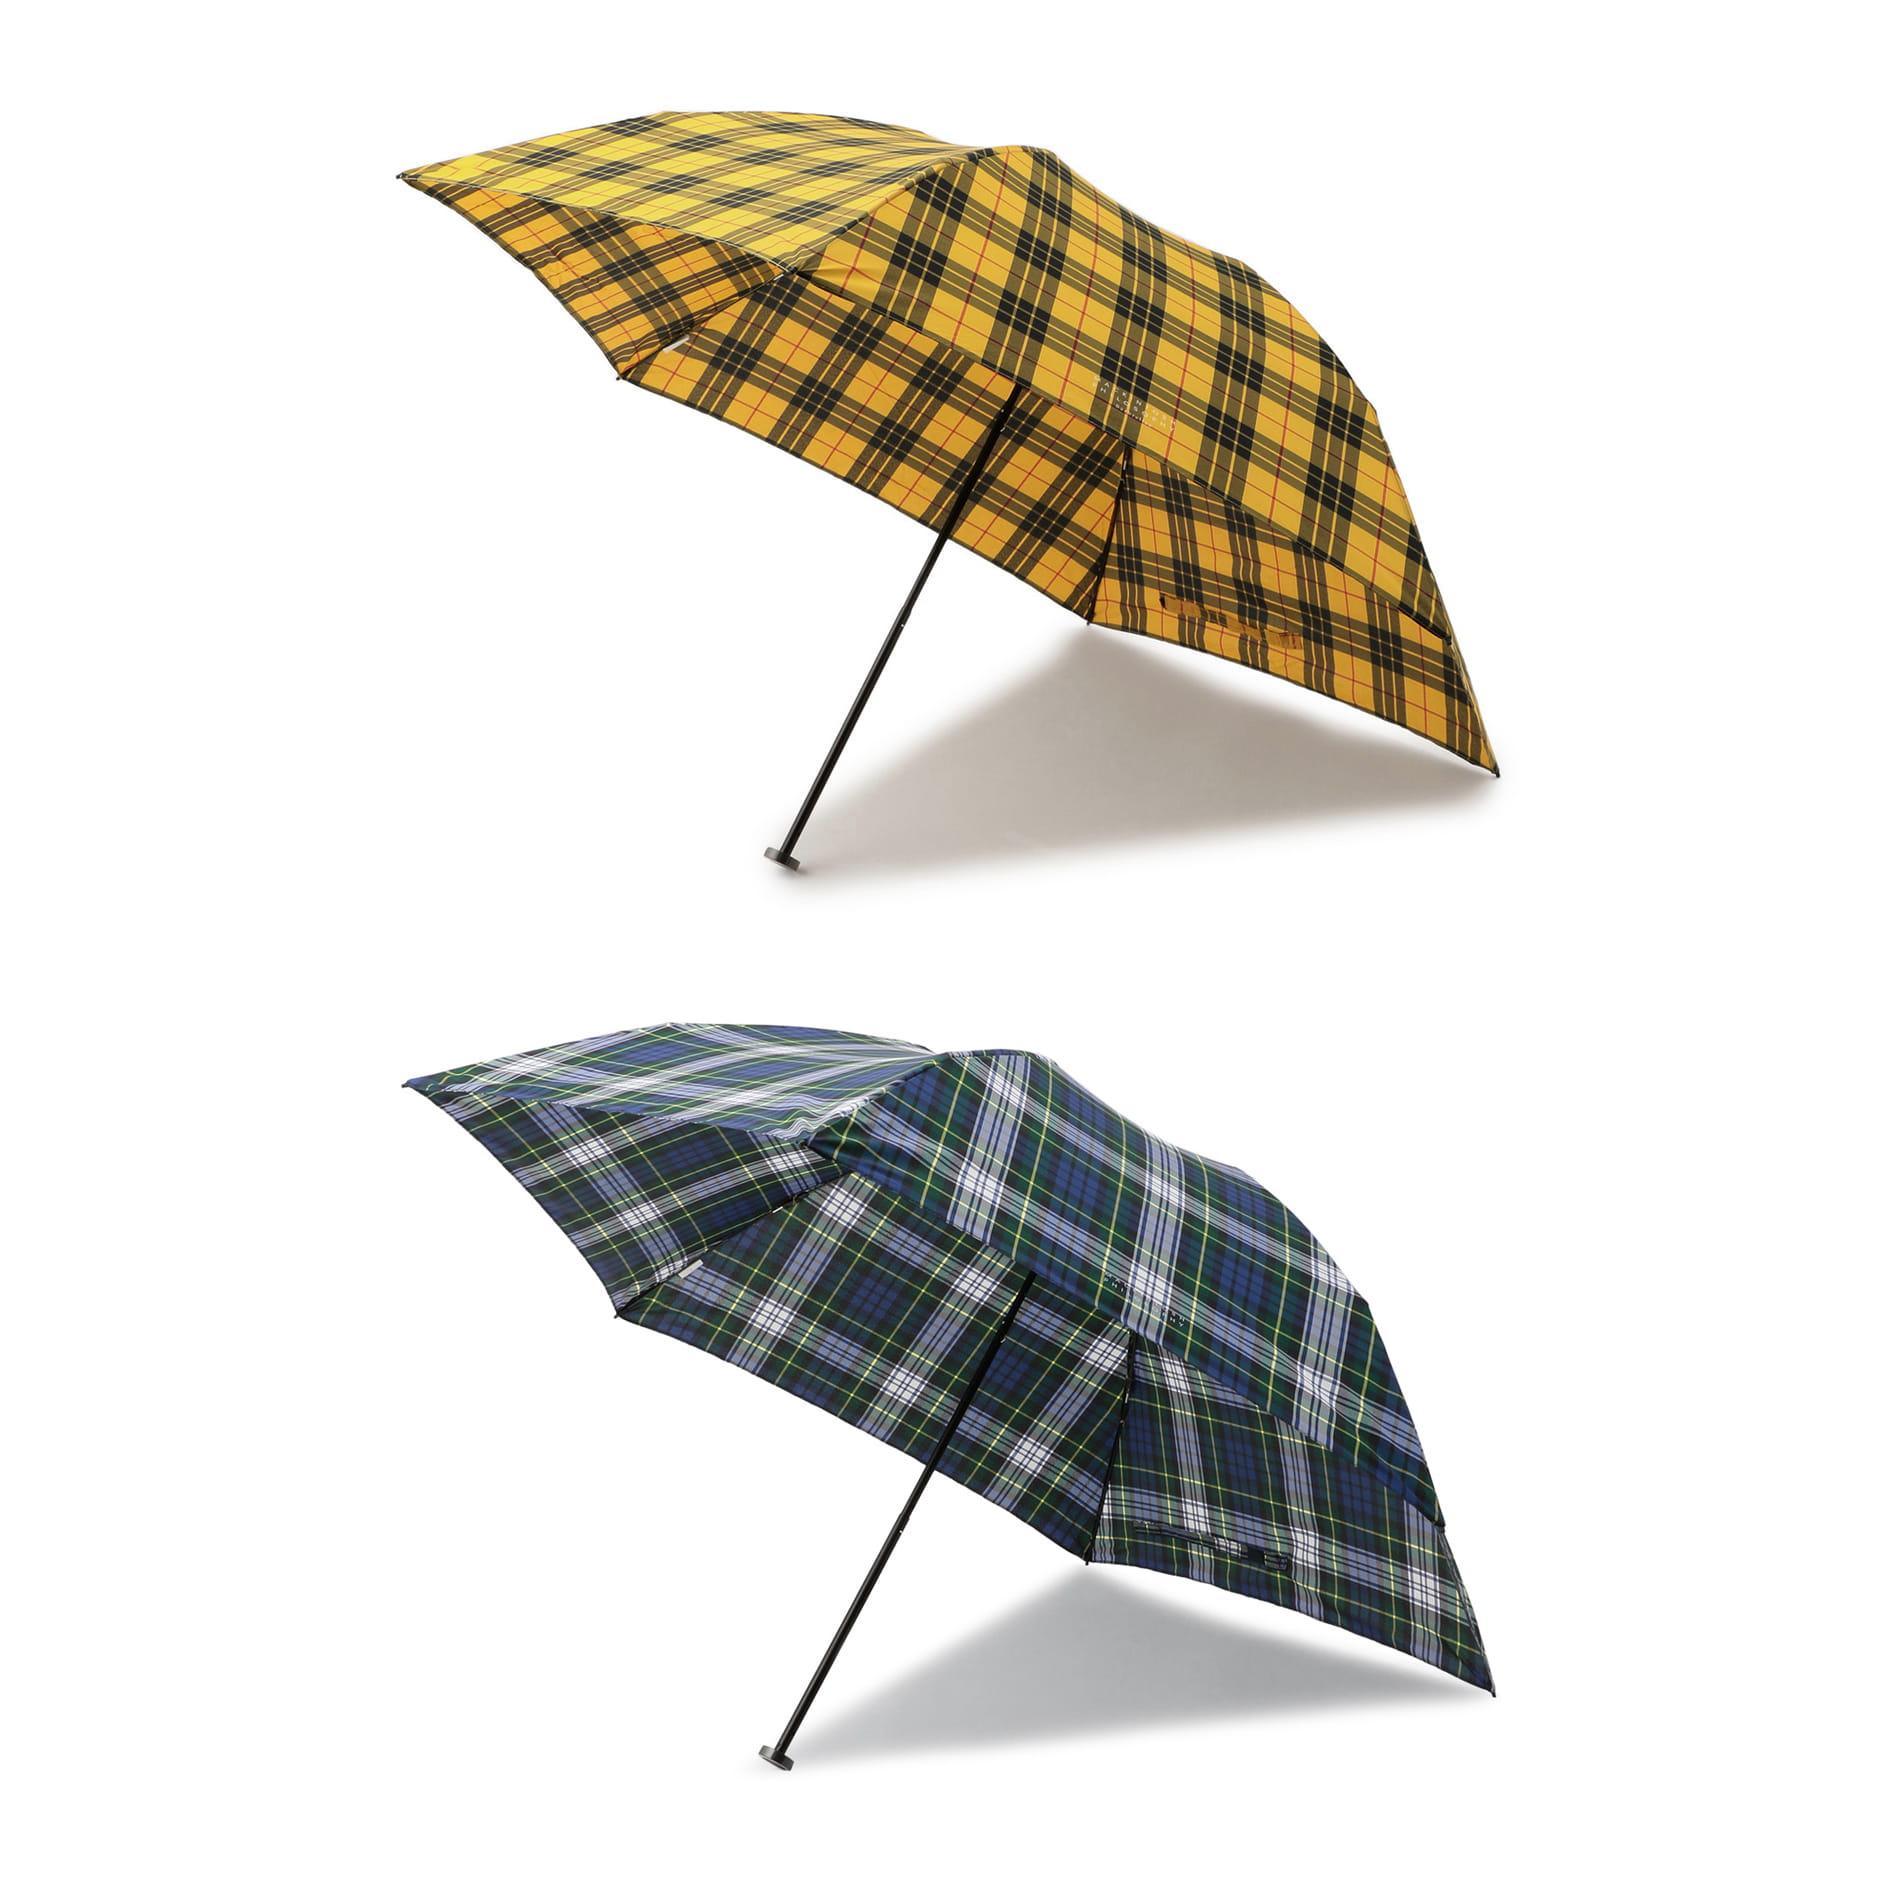 【Barbrella®】55cmタイプ軽量ミニ傘 チェック